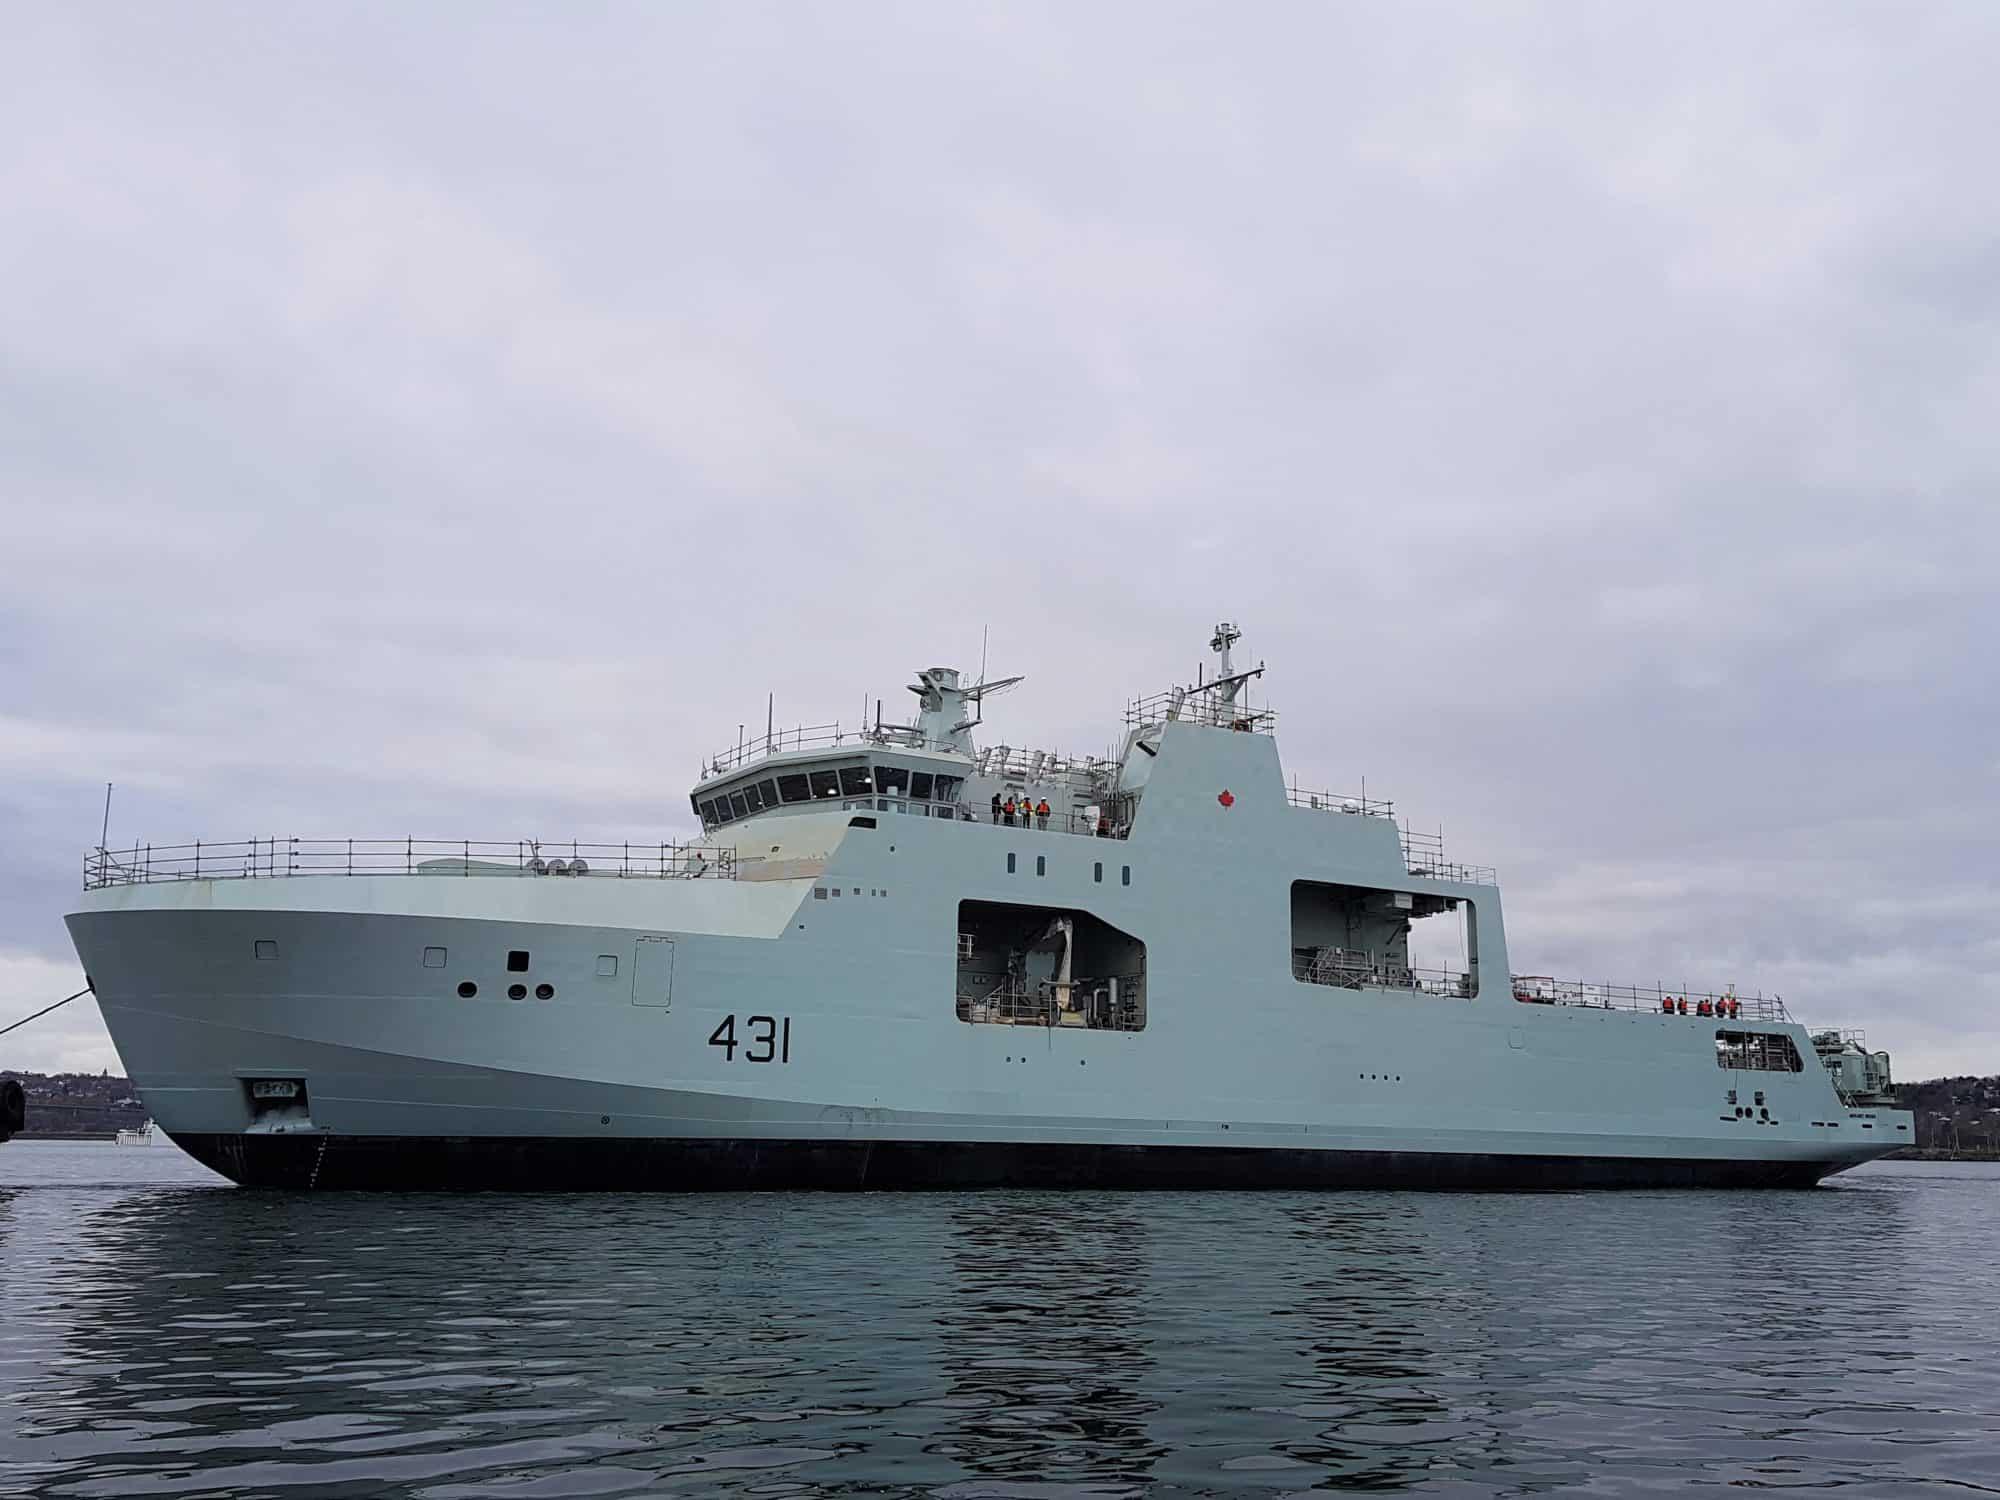 Майбутній HMCS «Margaret Brooke» (431) на воді